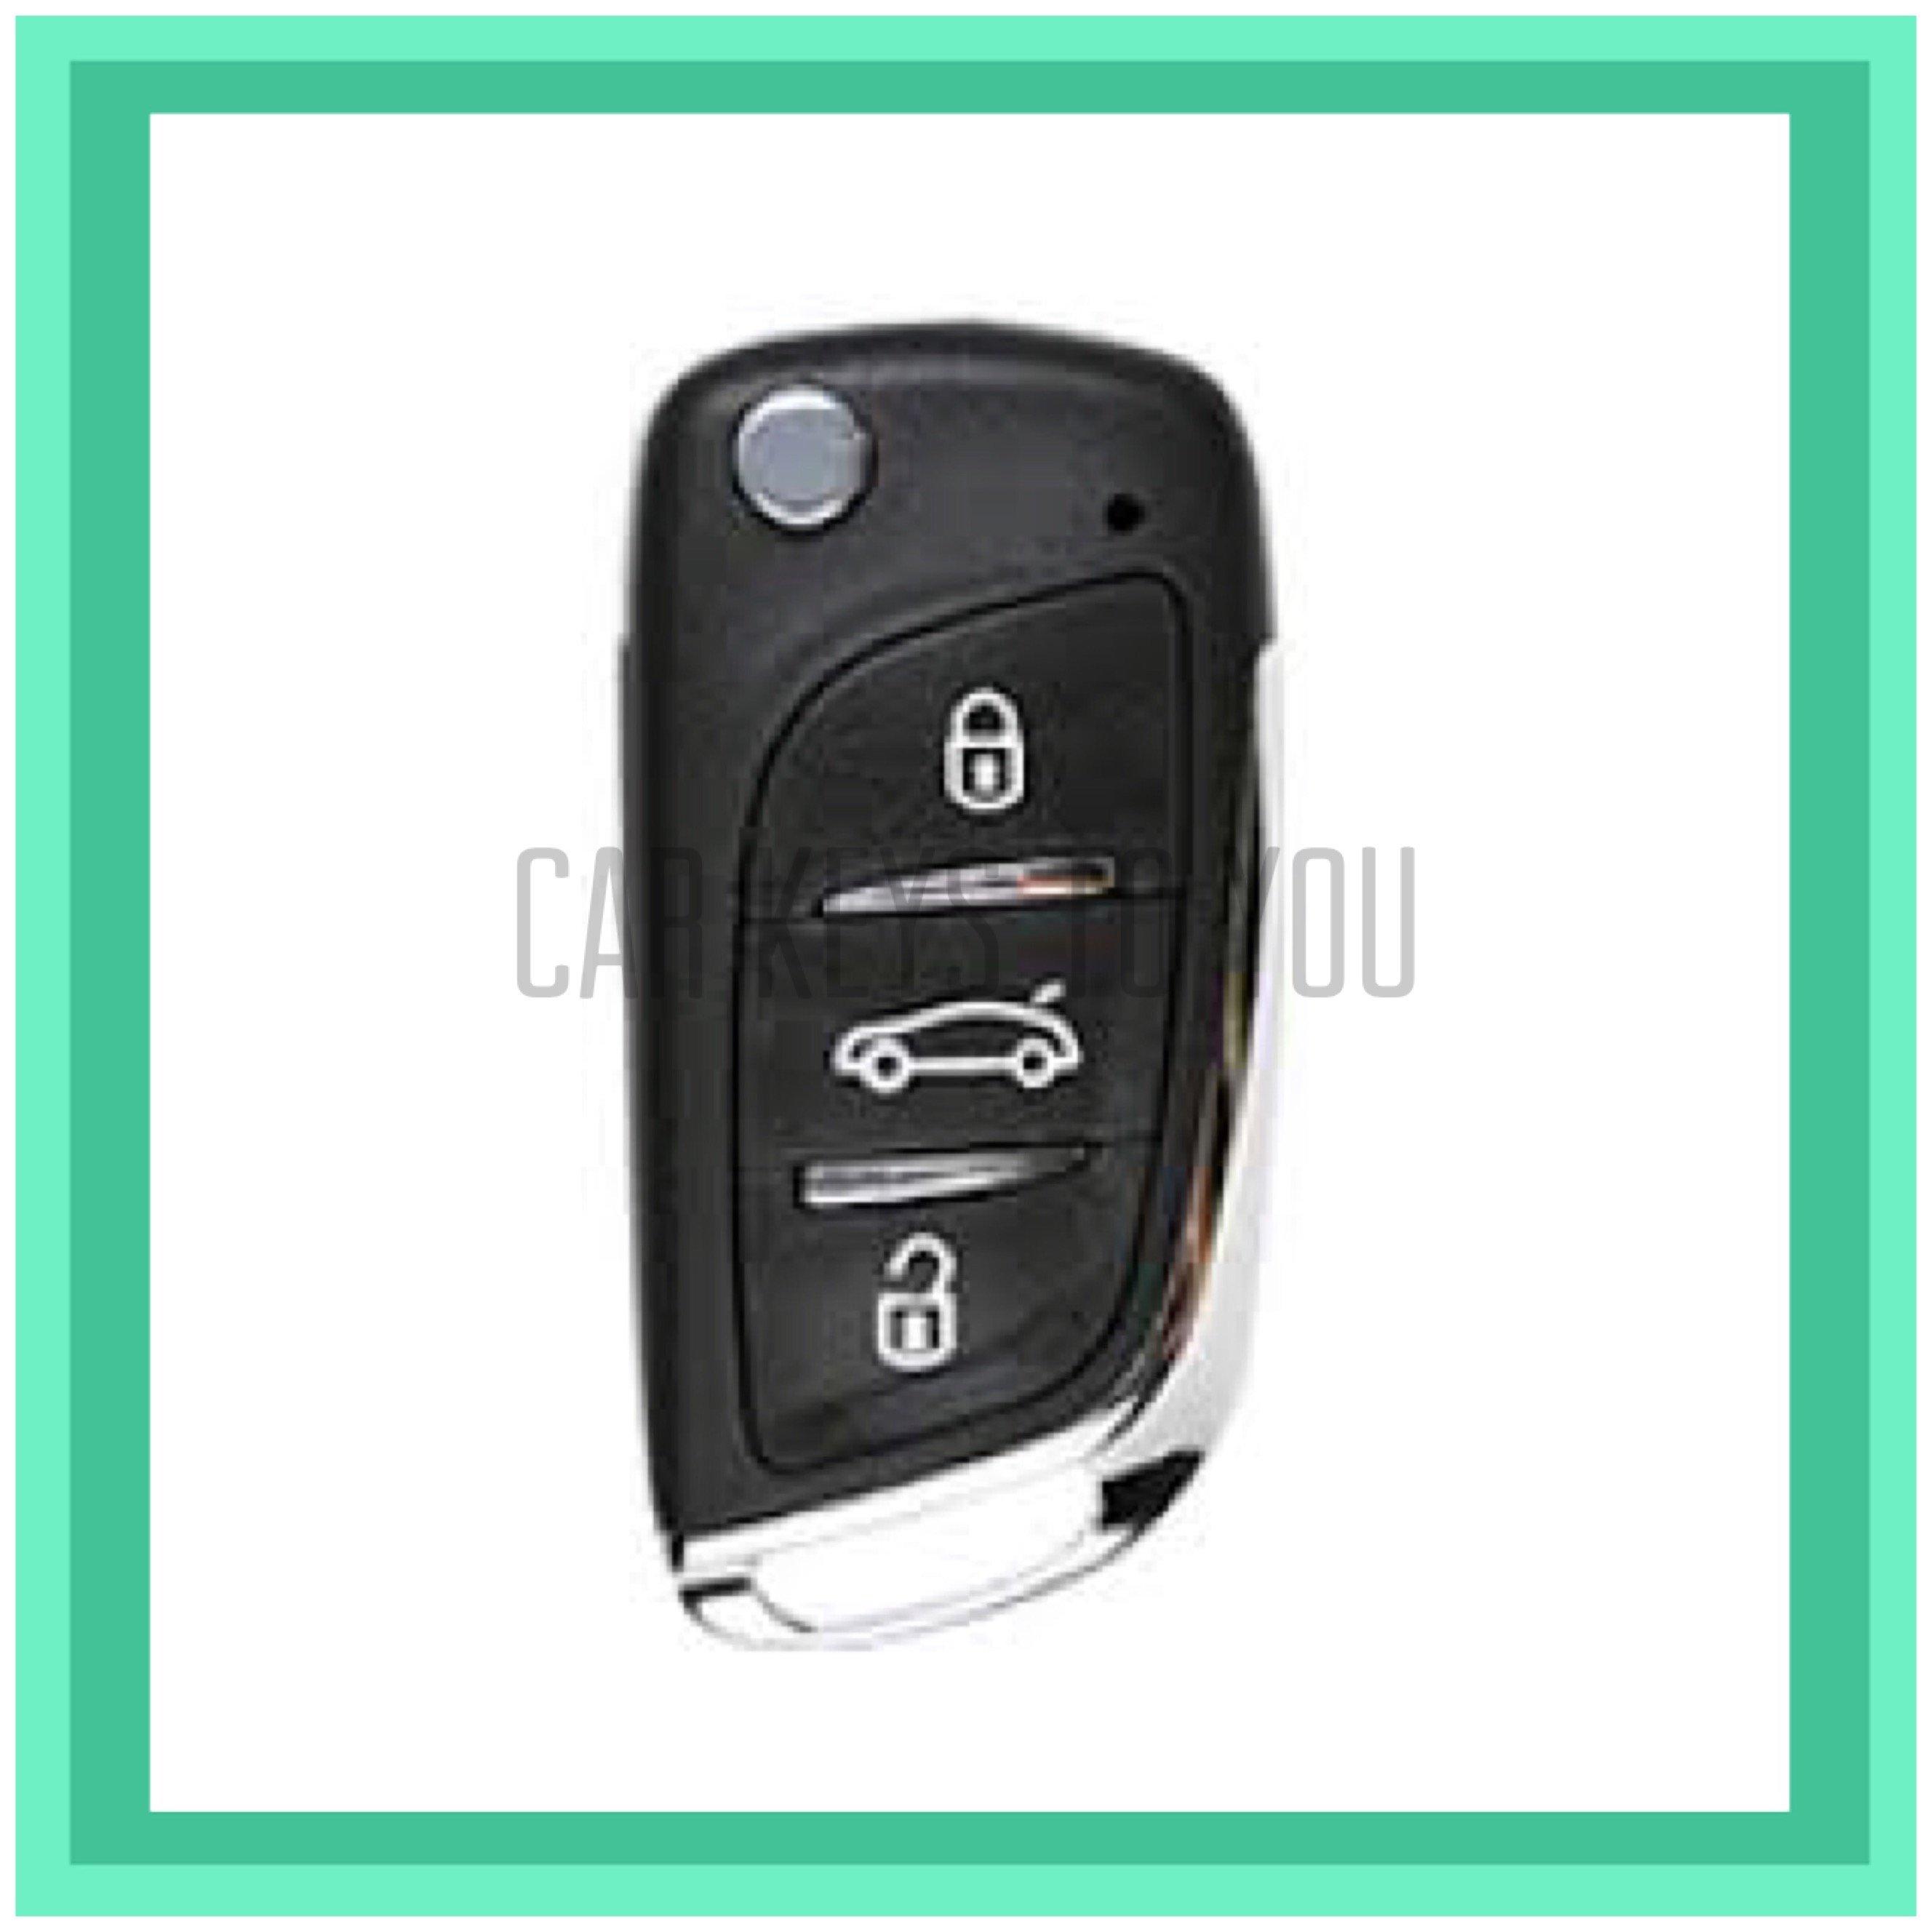 Great Wall V240 K2 Car Key and Remote, 2009-2011